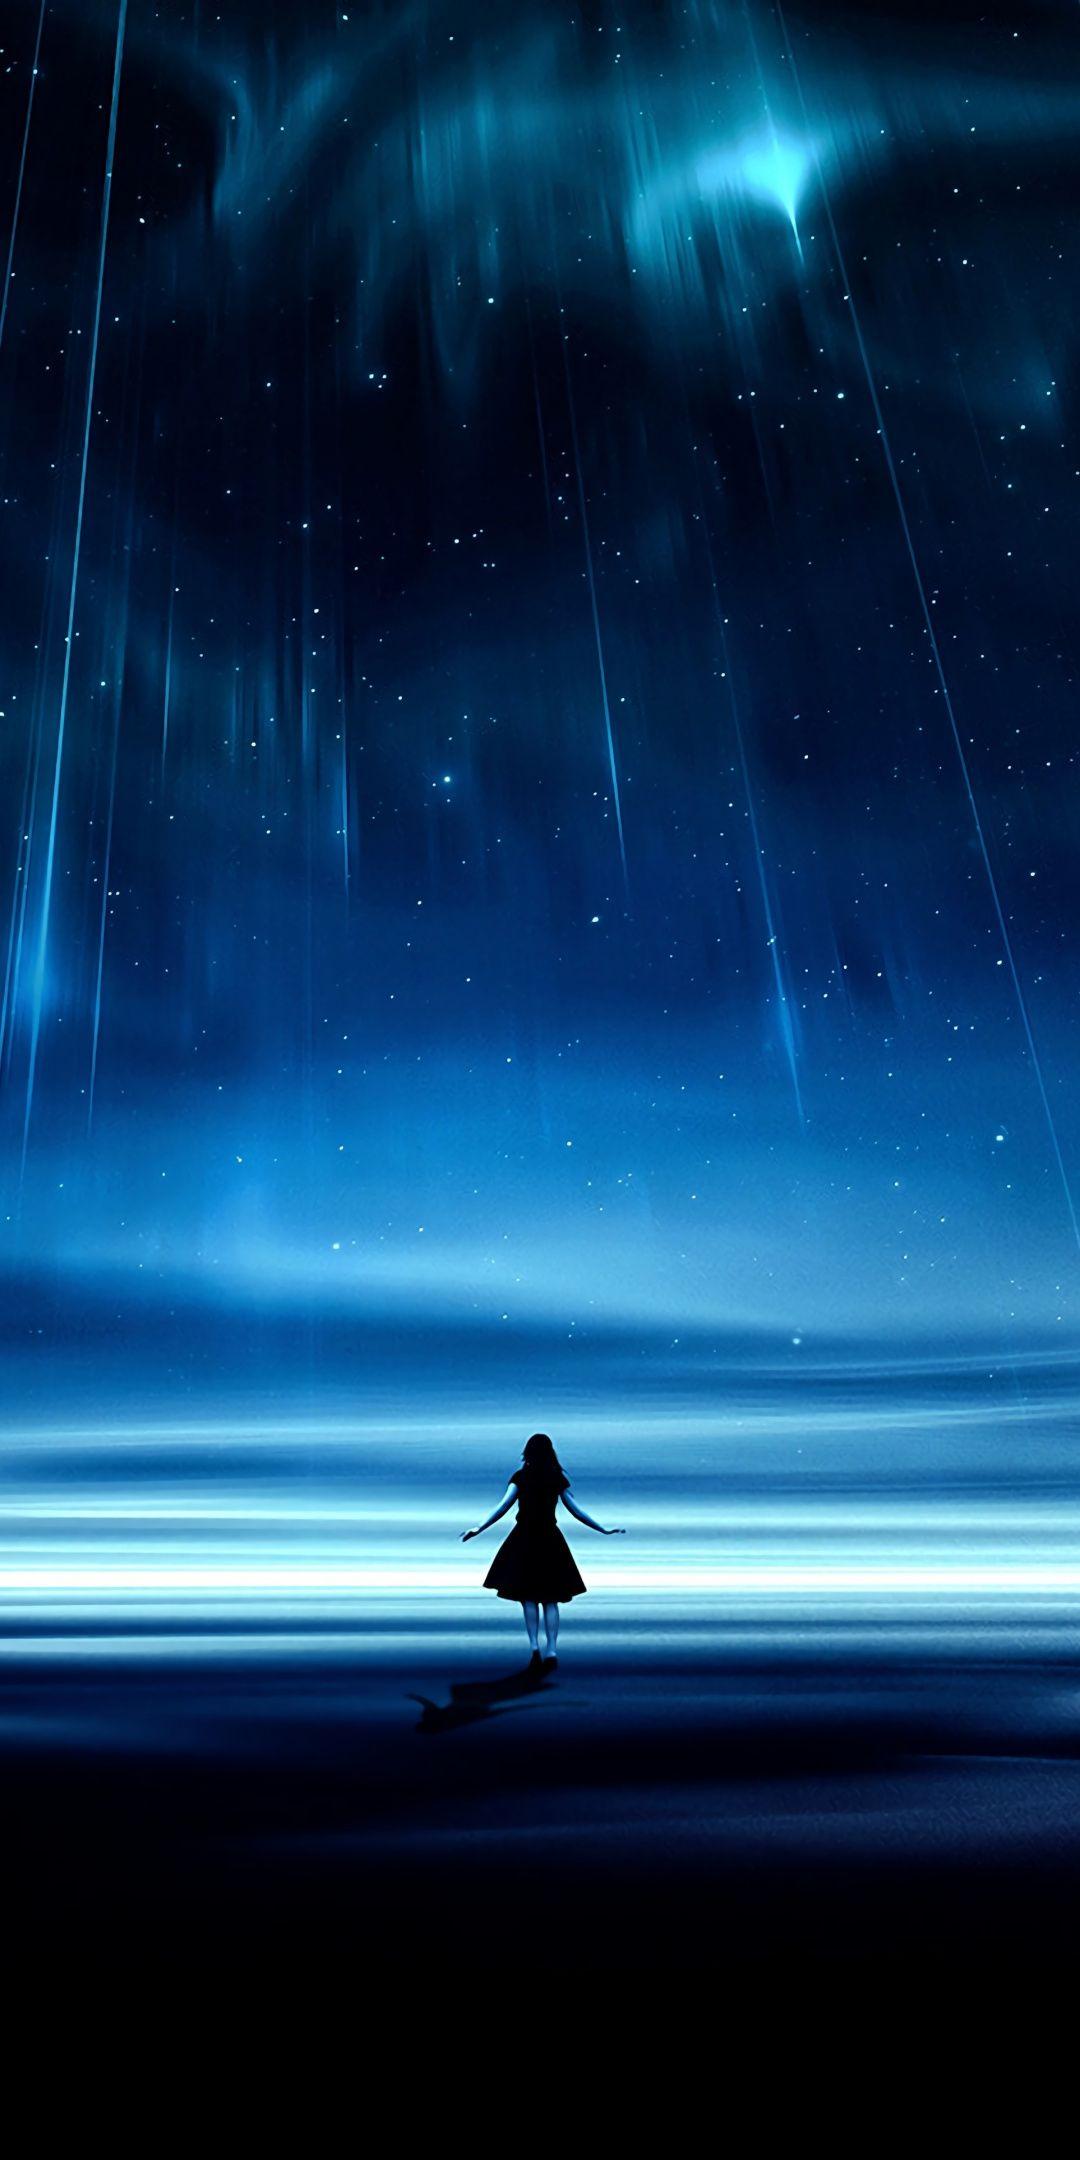 Silhouette Starry Sky Landscape Lights Art 1080x2160 Wallpaper Anime Scenery Night Scenery Anime Scenery Wallpaper